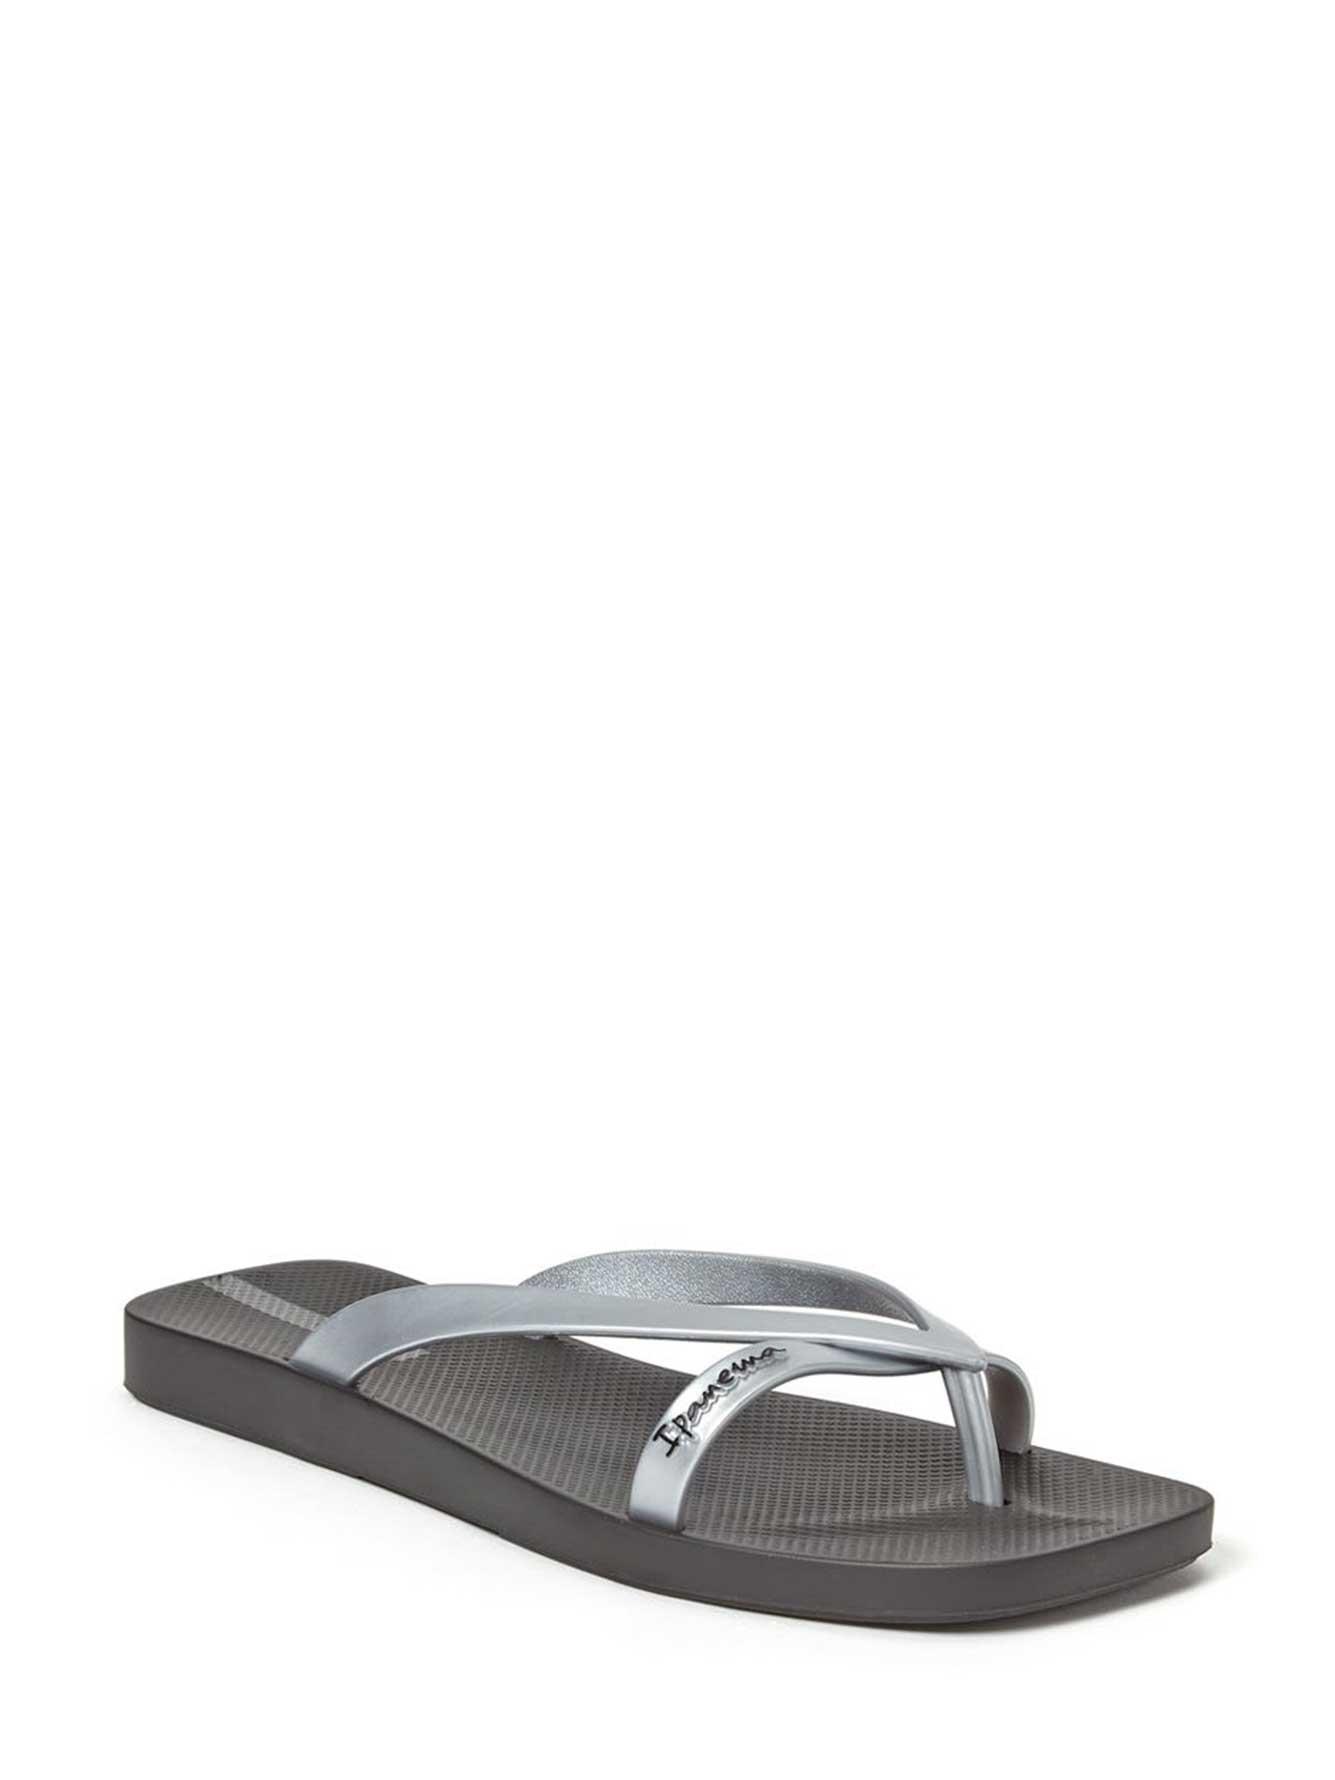 8245a5165230 Ipanema Kirey Double Strap Flip Flops